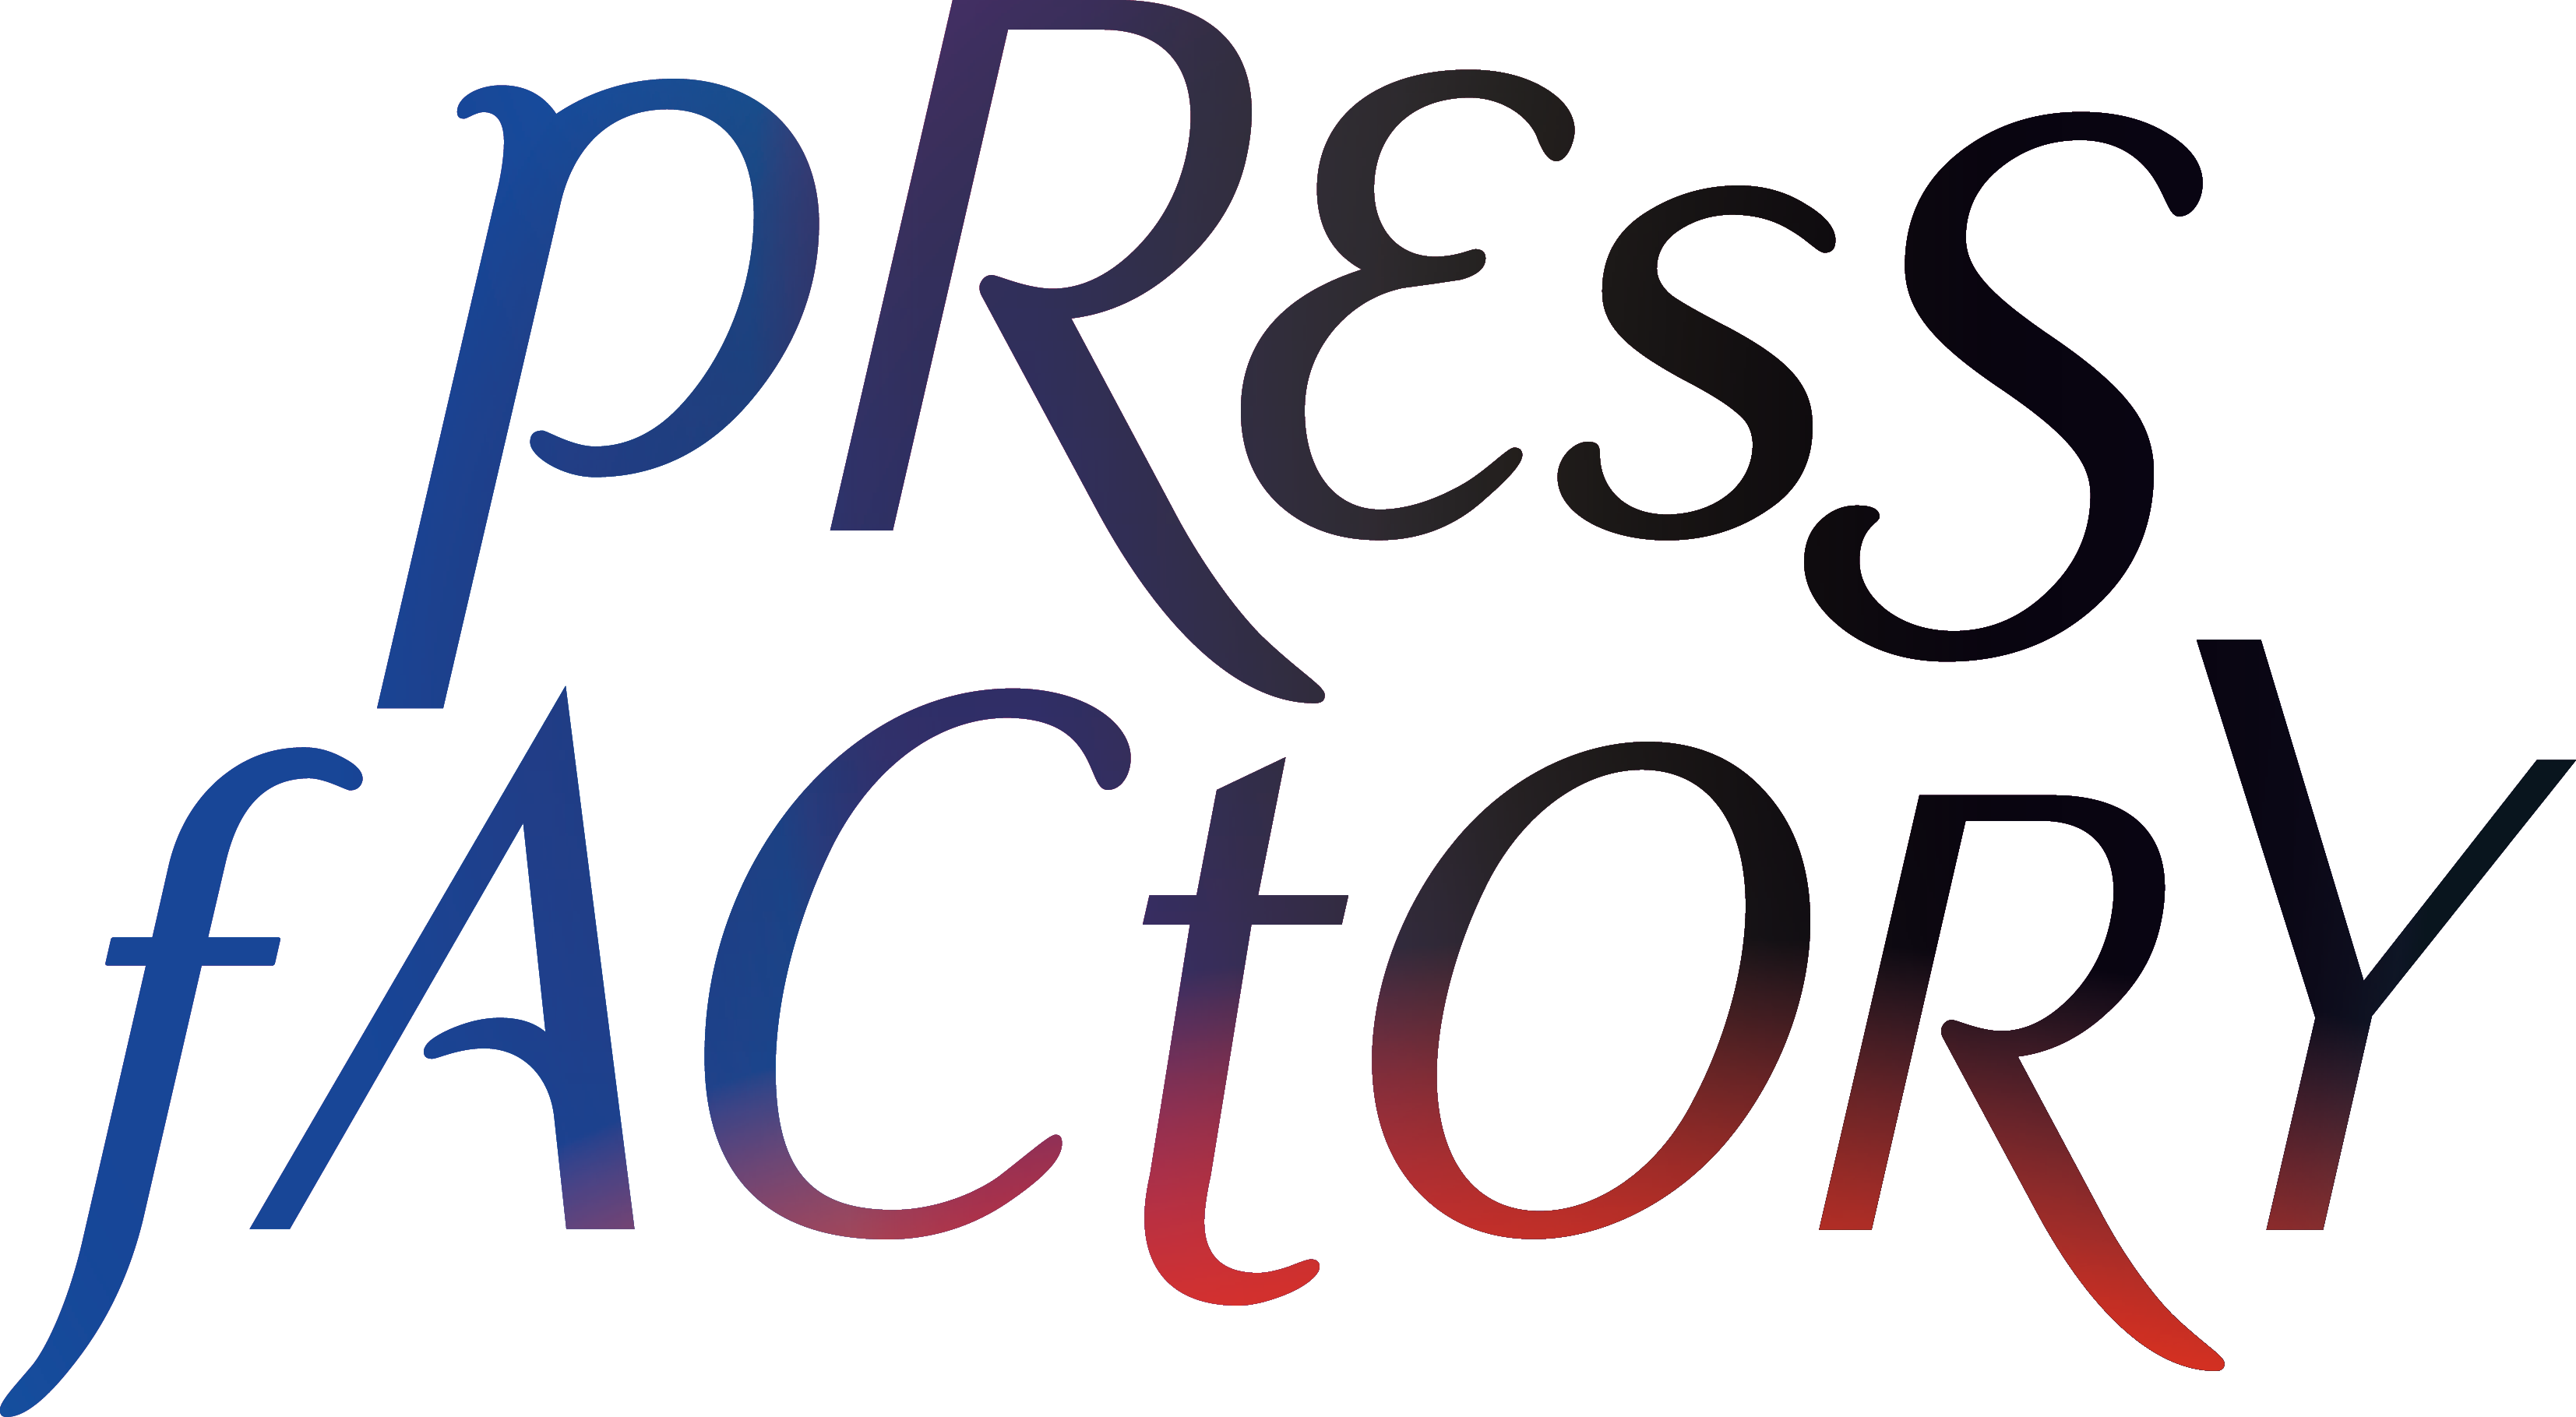 PRESS FACTORY – Public Relations